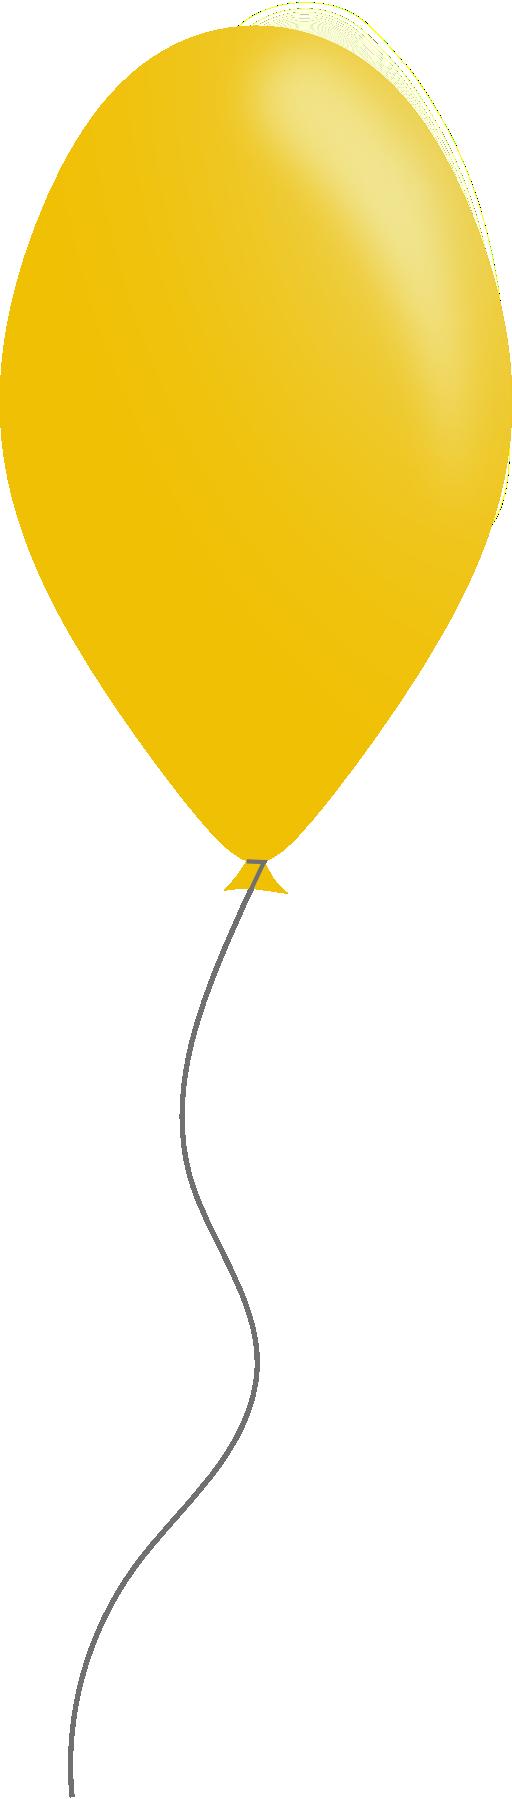 Clipart phone yellow. Balloon i royalty free